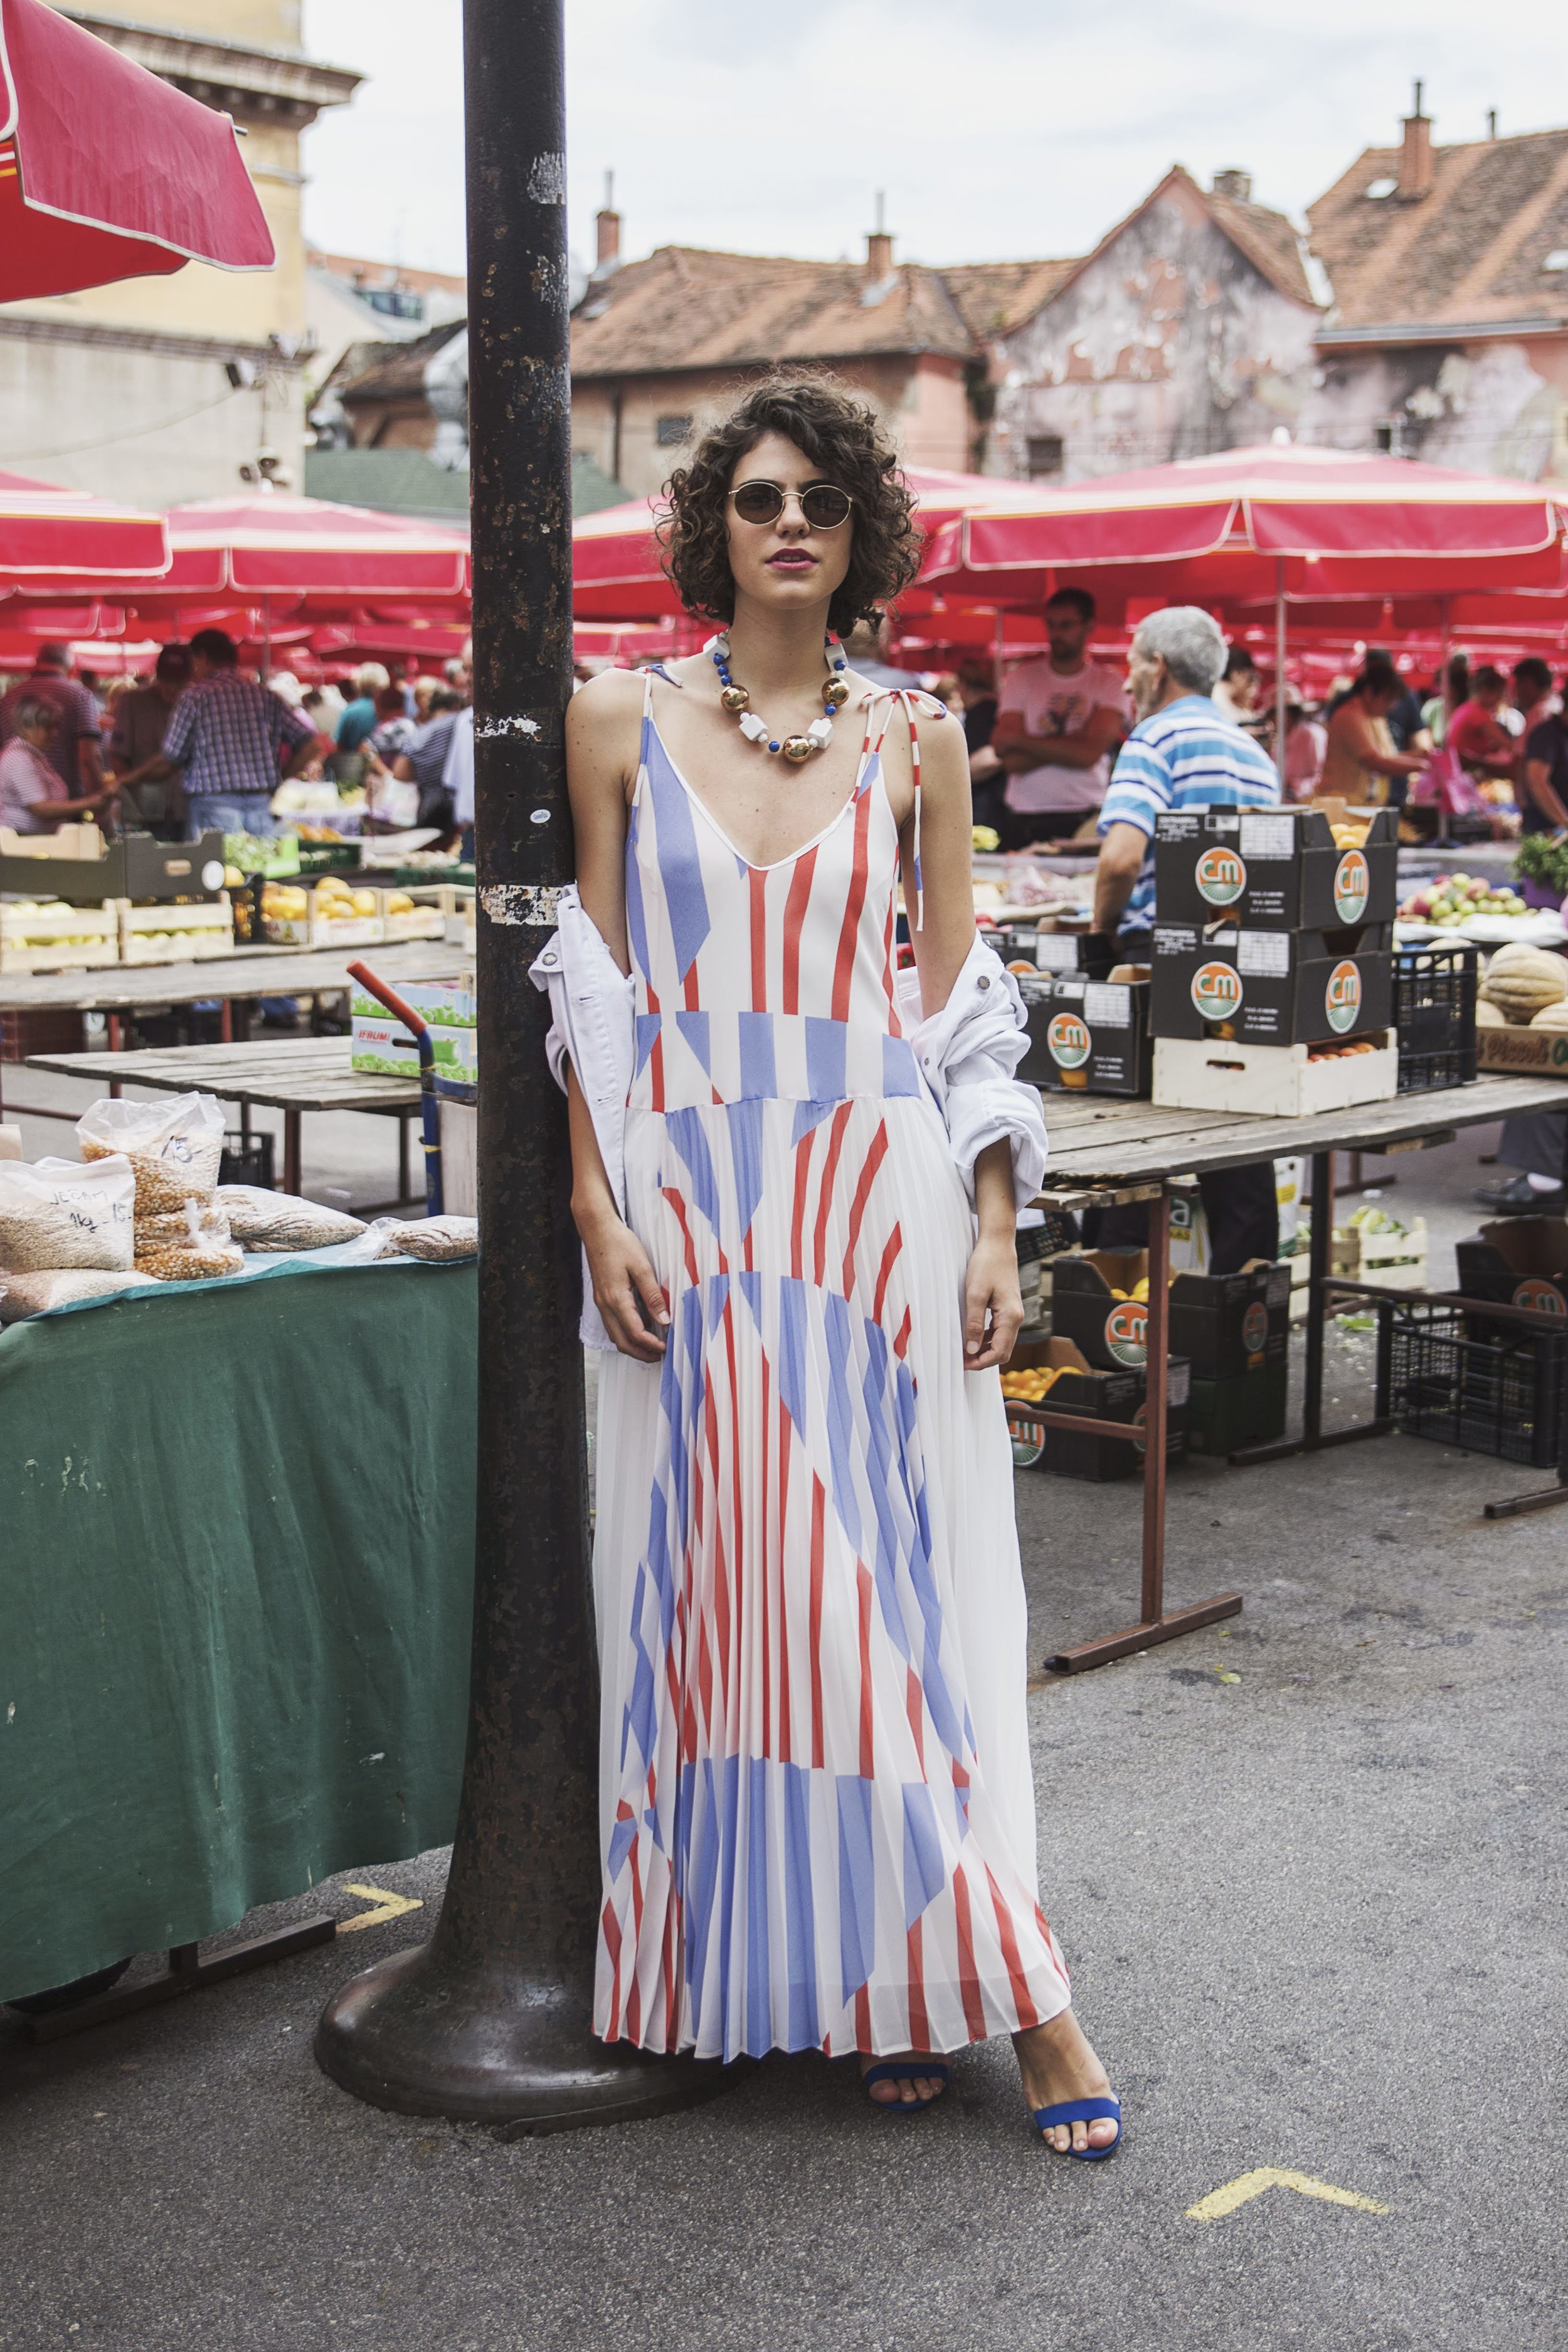 luka-lajic-fashion-photography-robert-sever-dizajner-croatian (9).jpg